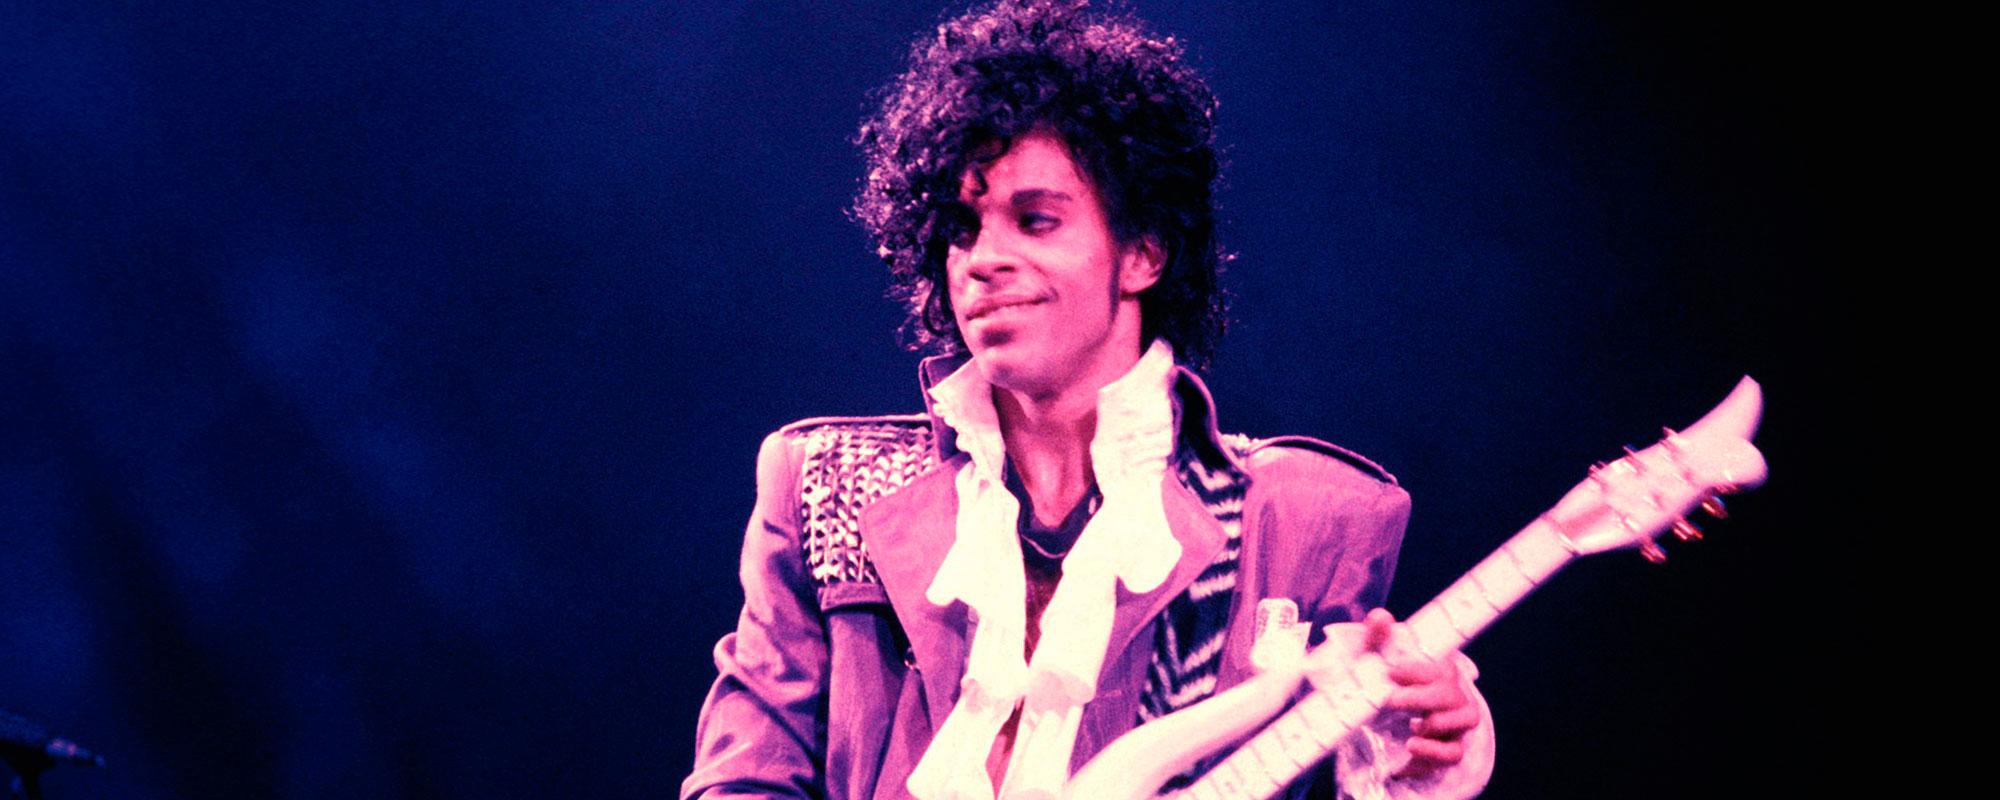 prince-photo-live